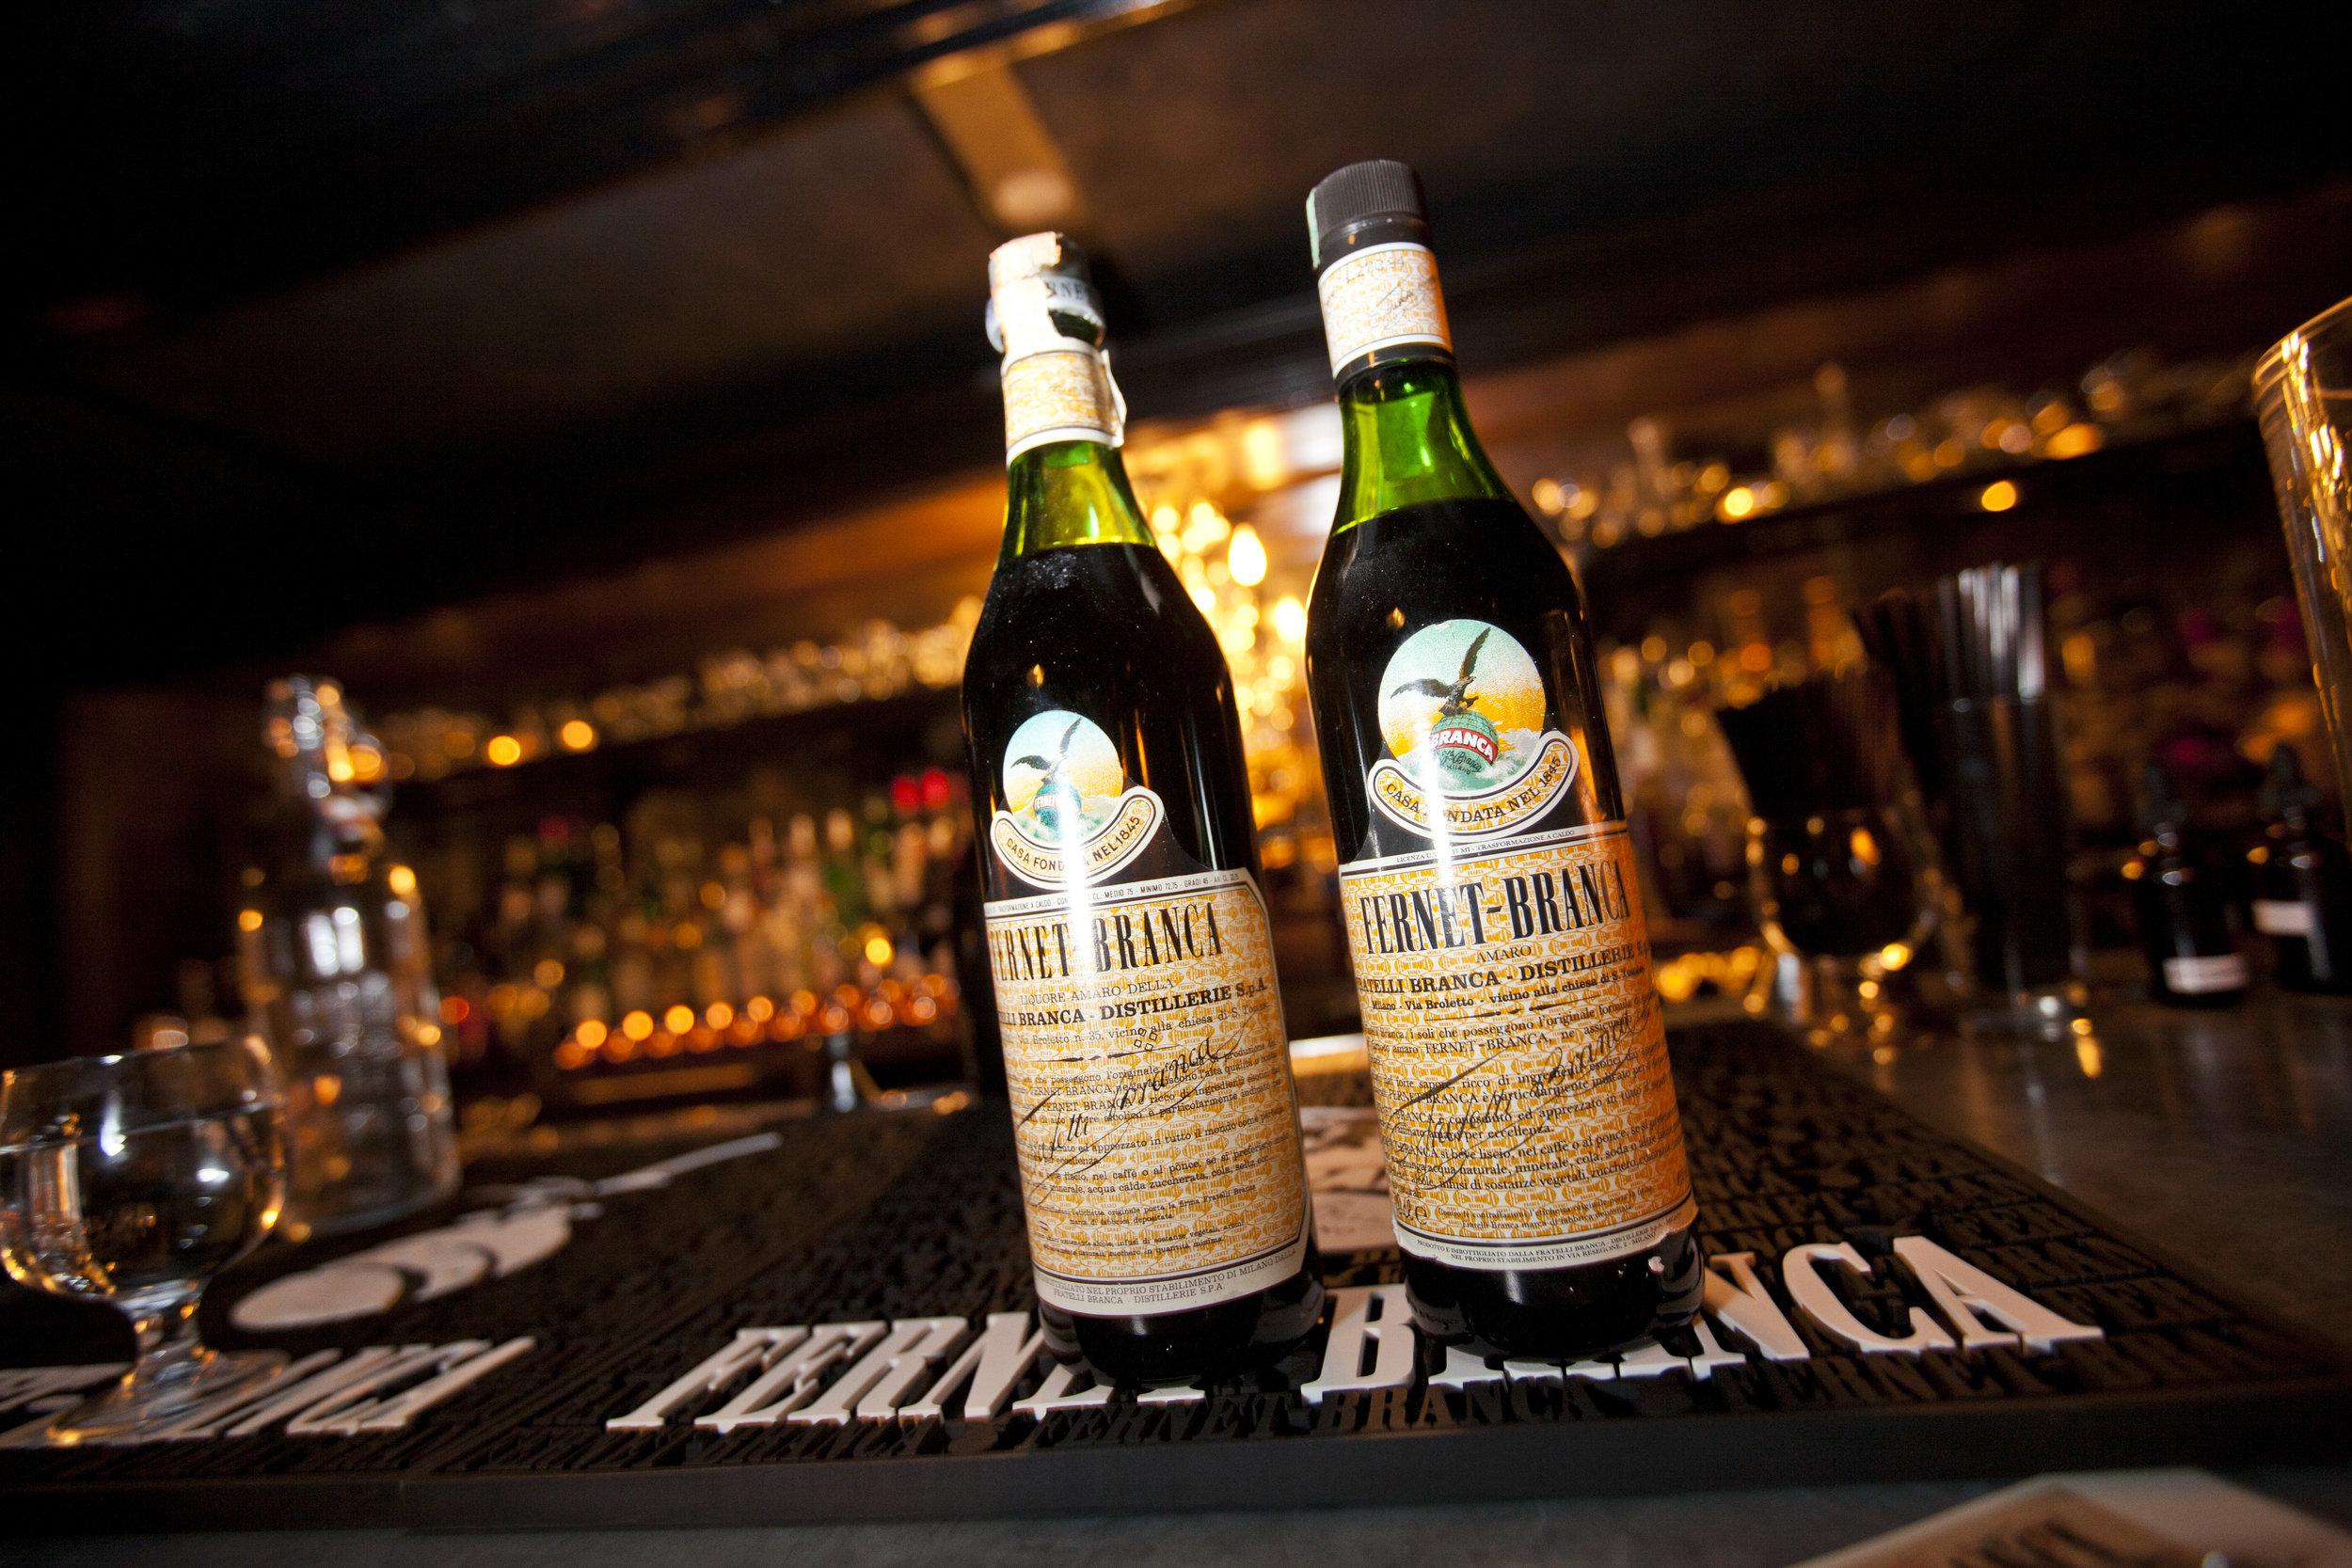 Fernet Branca at Chicago's Gilt Bar. Photo:Sammy Faze